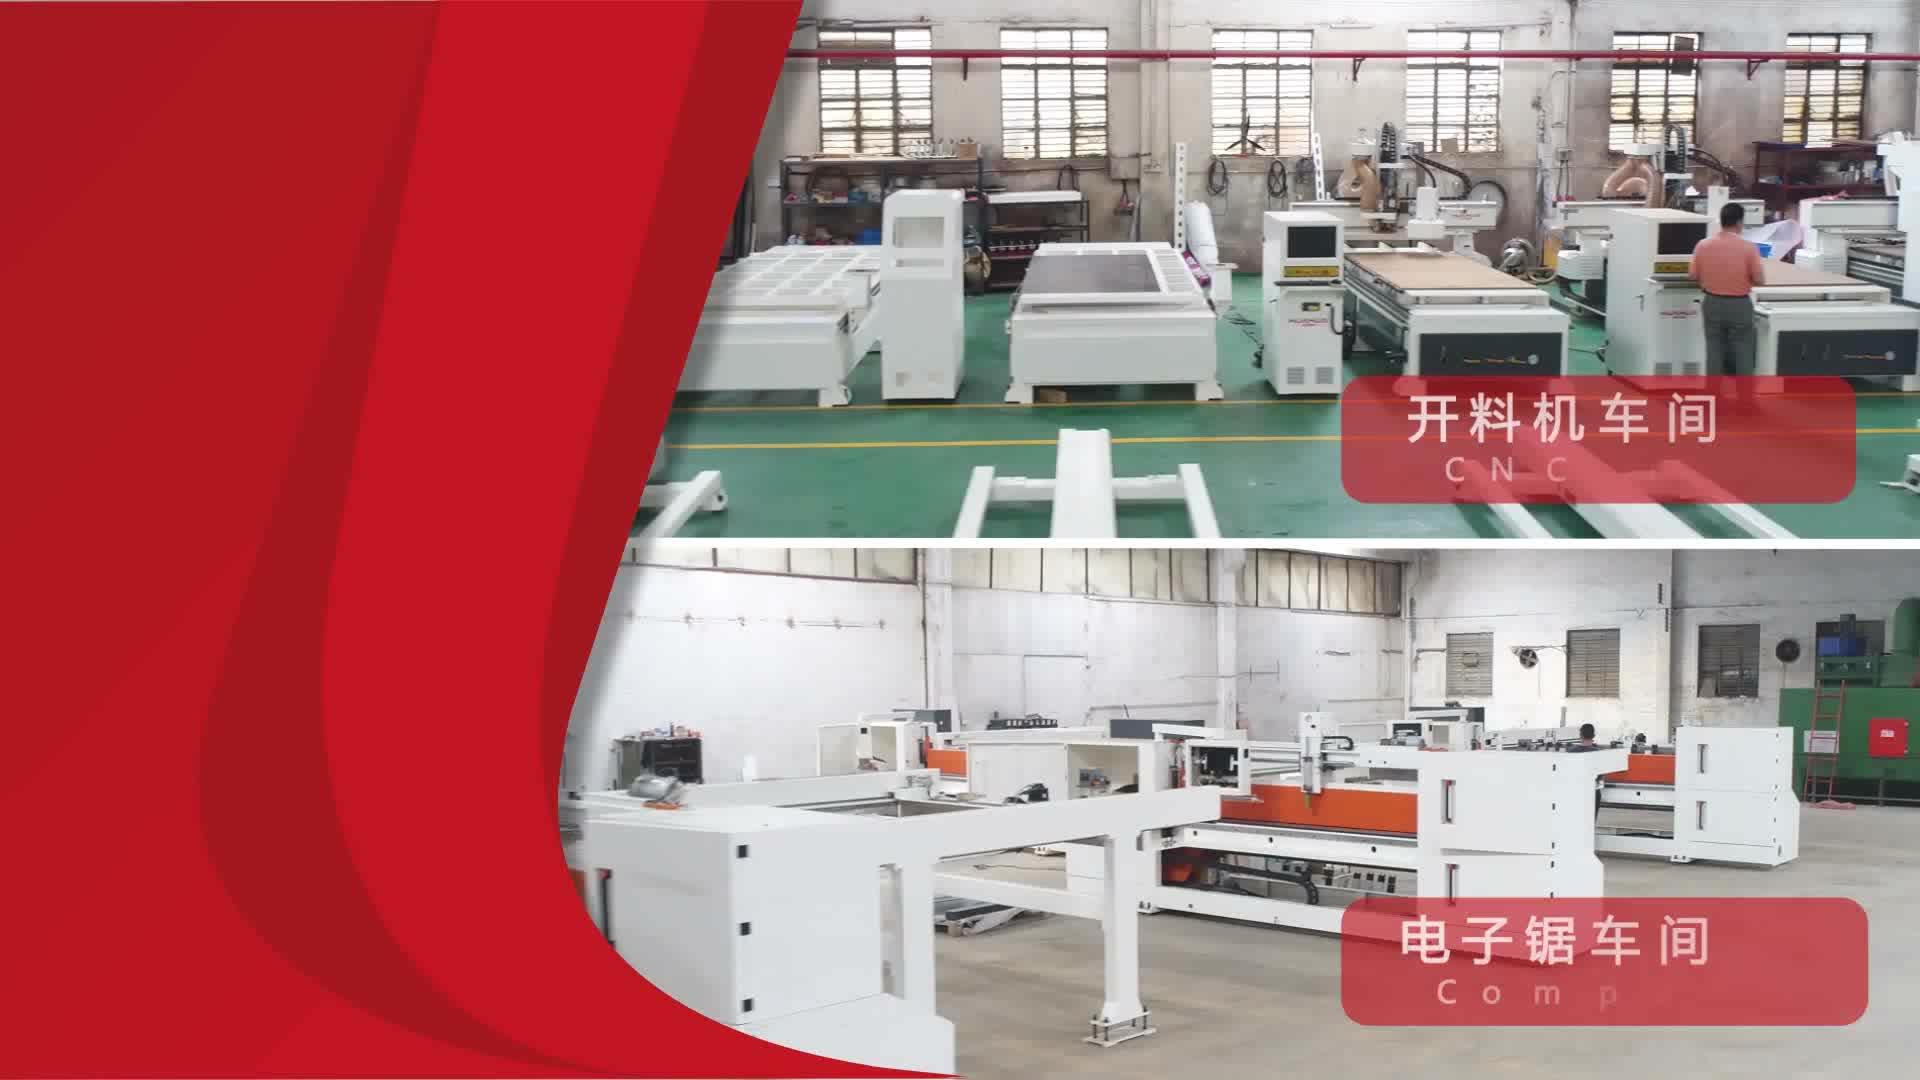 SKH690 boren panel 6 kanten gaten cnc boormachine